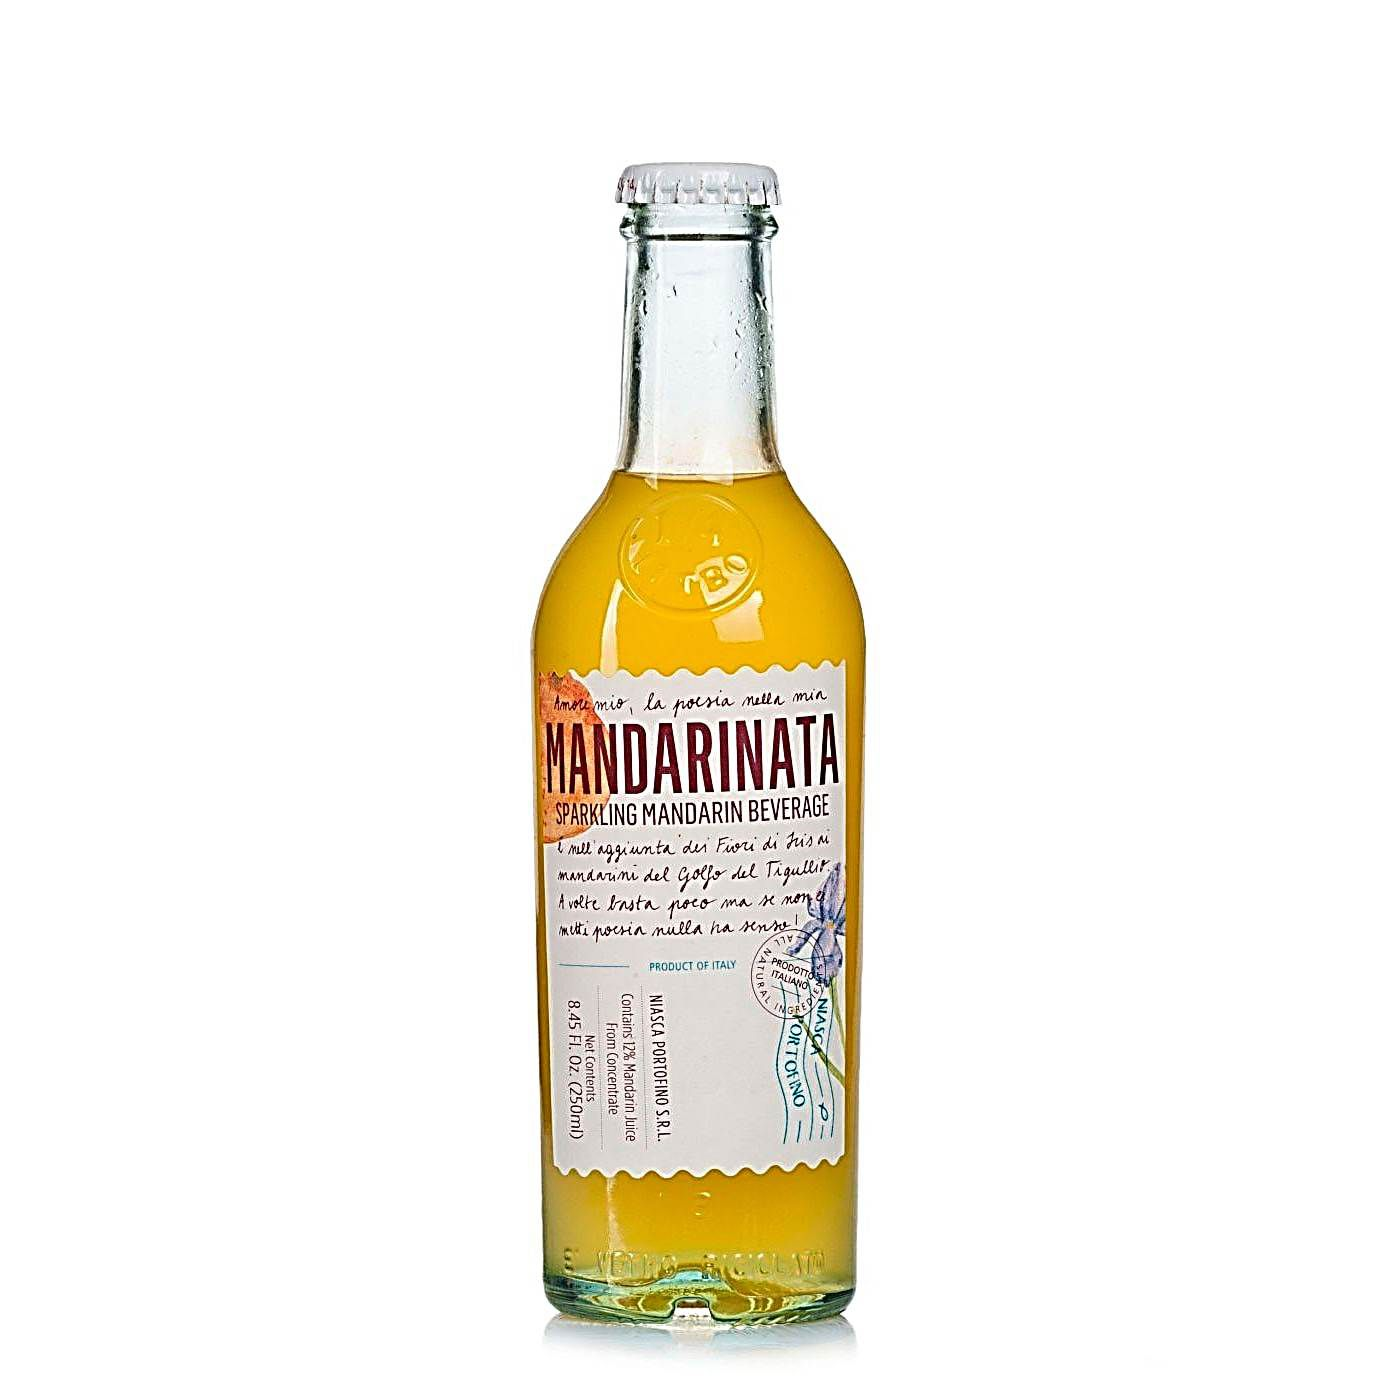 Mandarinata Bebida Italiana Gaseificada Niasca 250ml